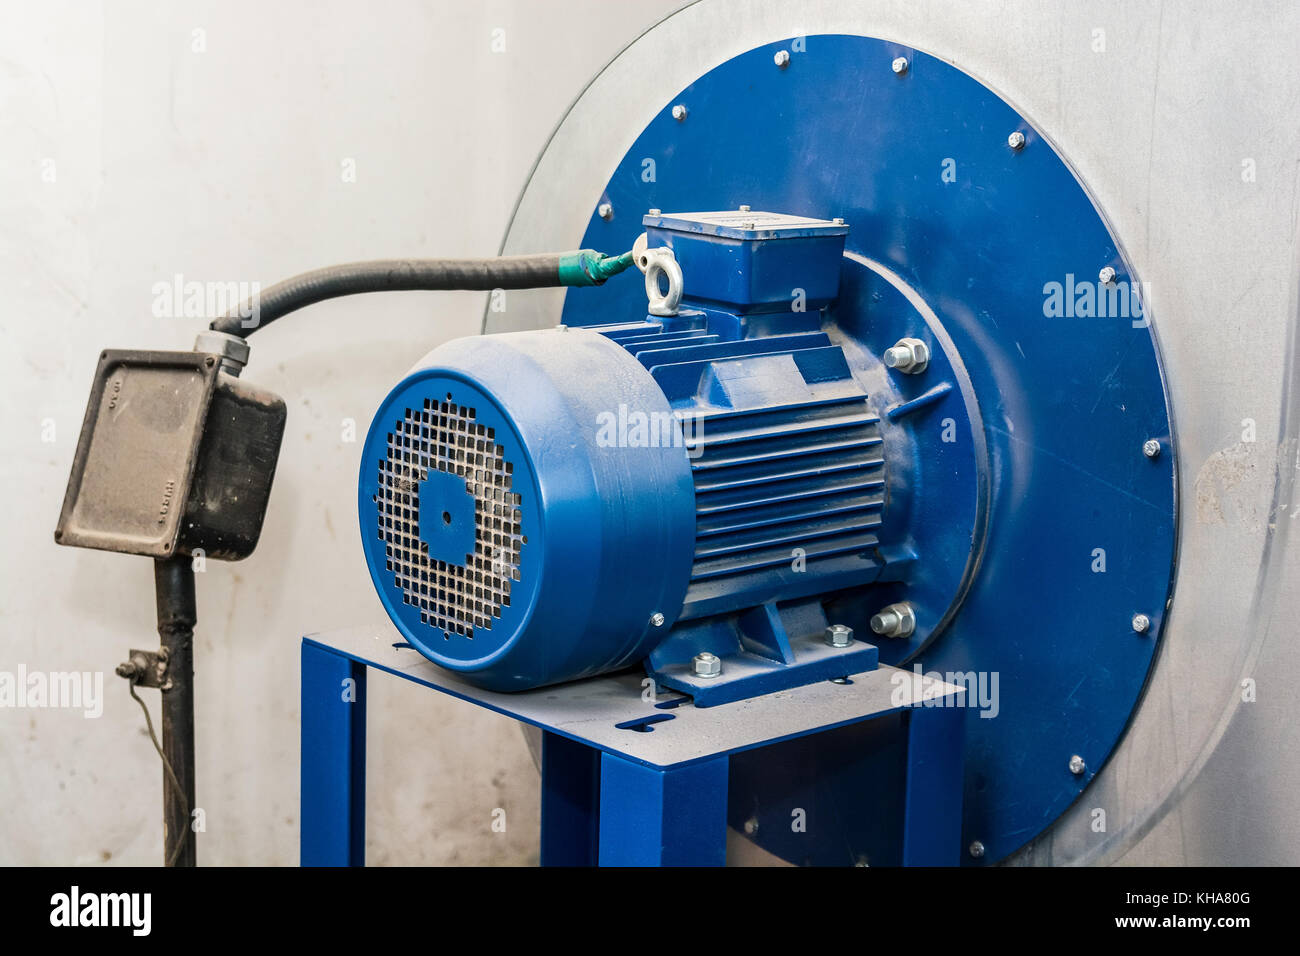 Electric Motor Stock Photos & Electric Motor Stock Images - Alamy